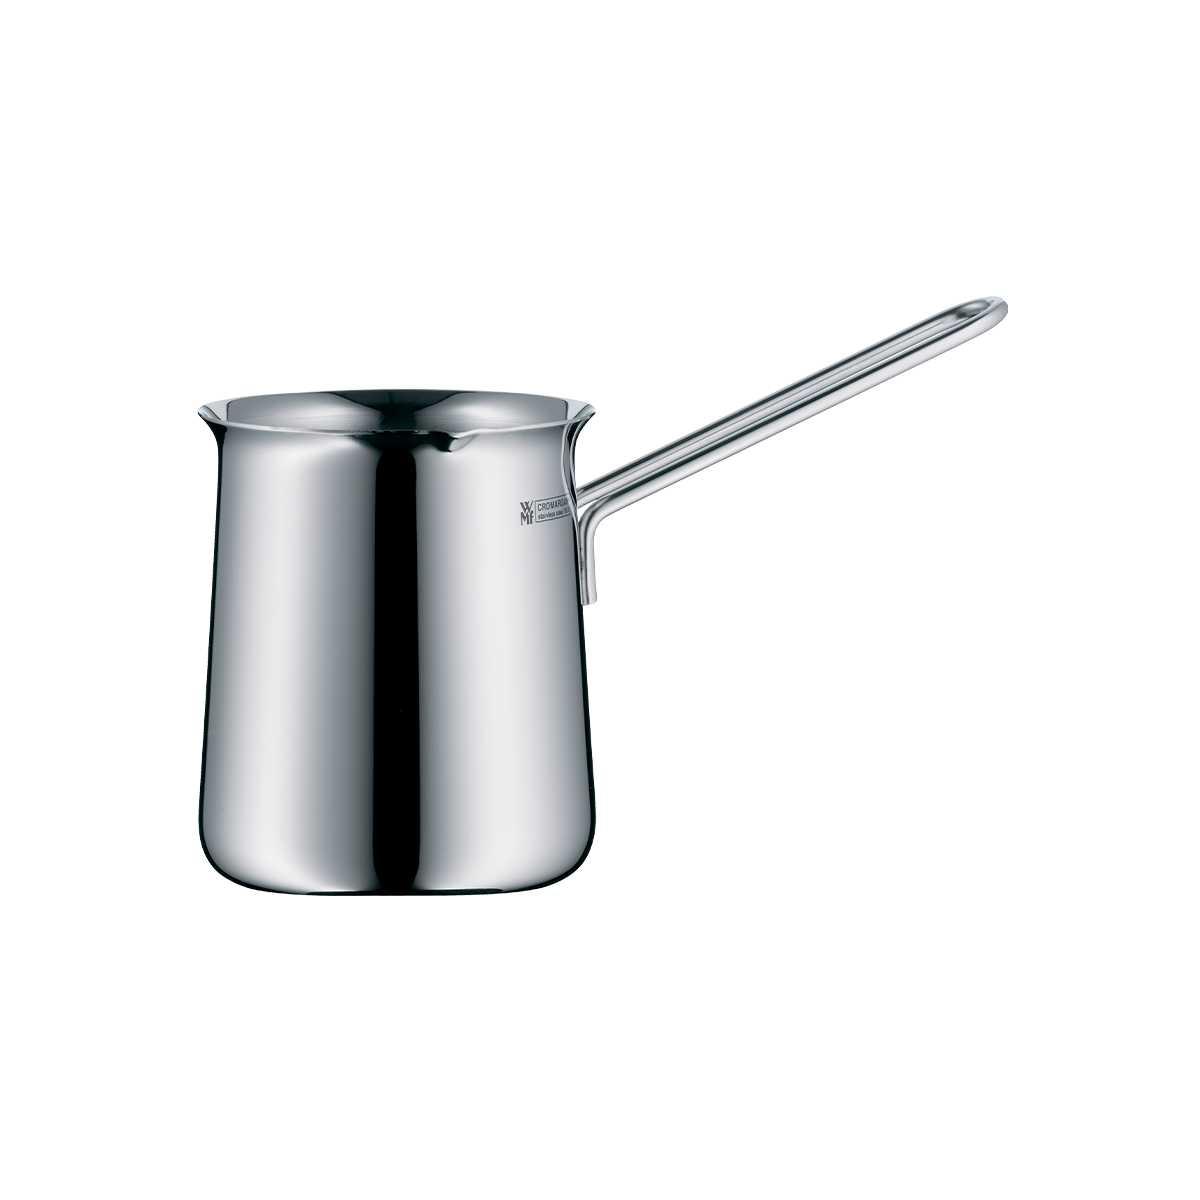 Онлайн каталог PROMENU: Турка для кофе WMF GRAND GOURMET, объем 0,34 л, серебристый WMF 06 4711 6040